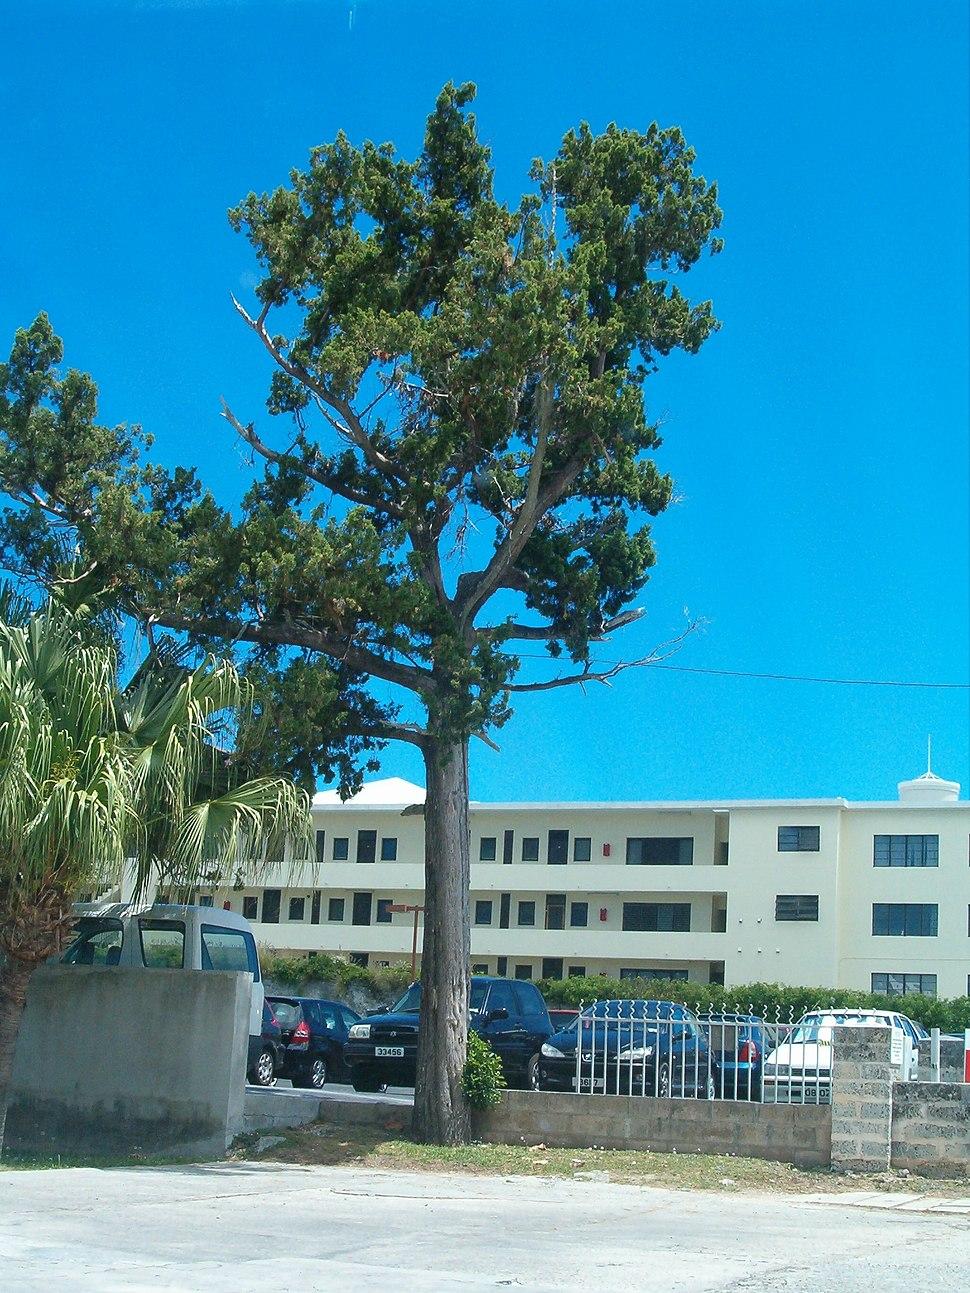 Image-Juniperus bermudiana - mature